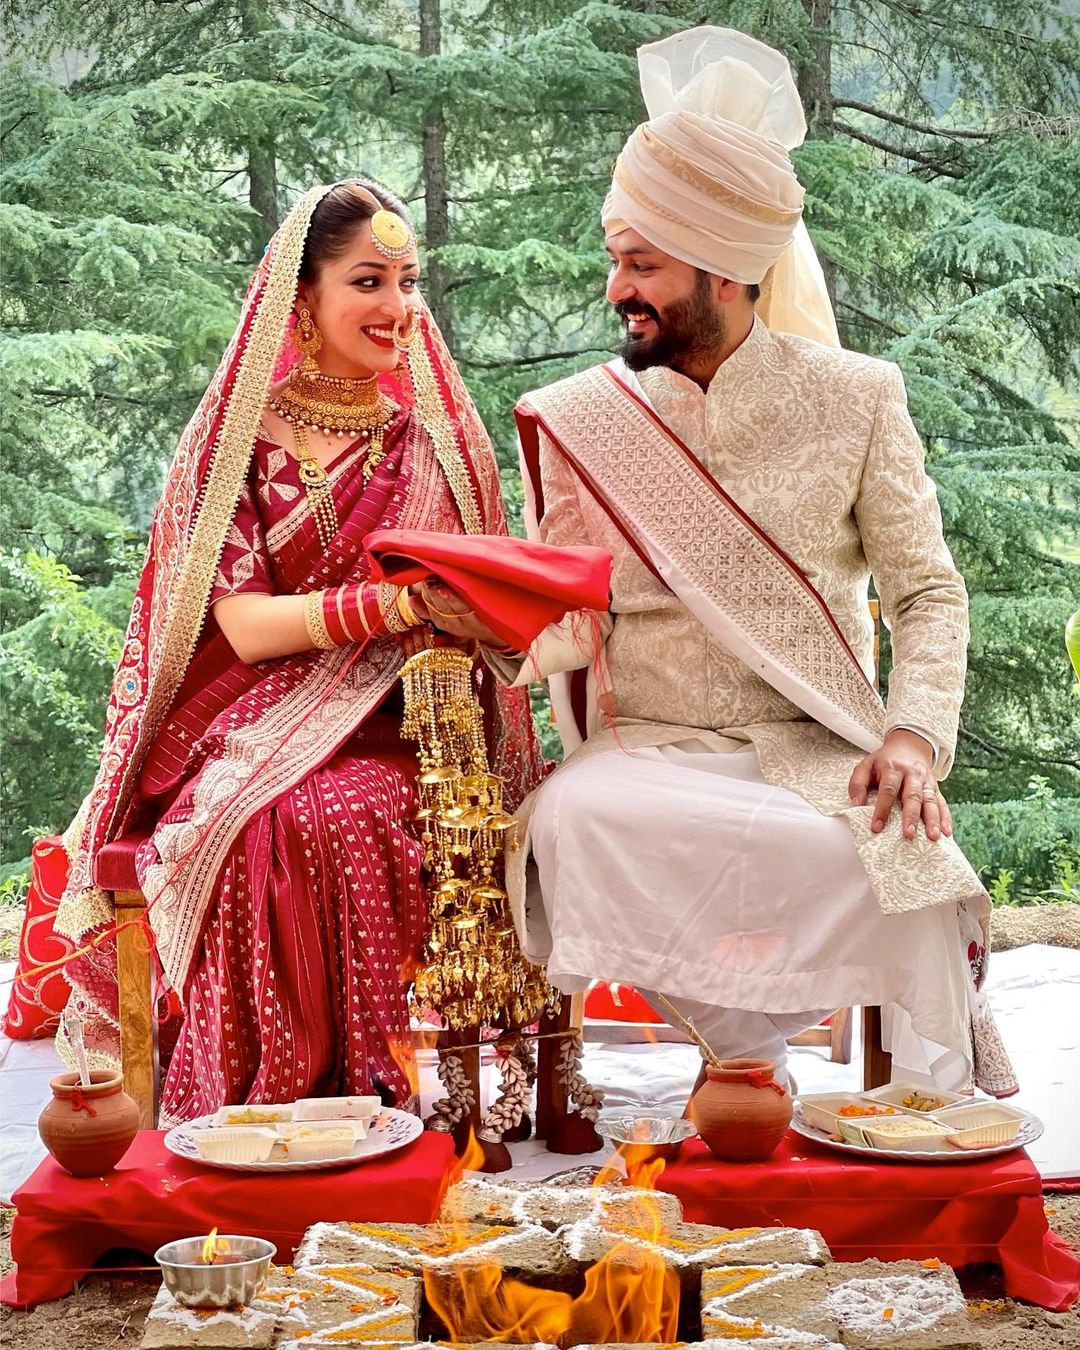 yami gautam's wedding looks